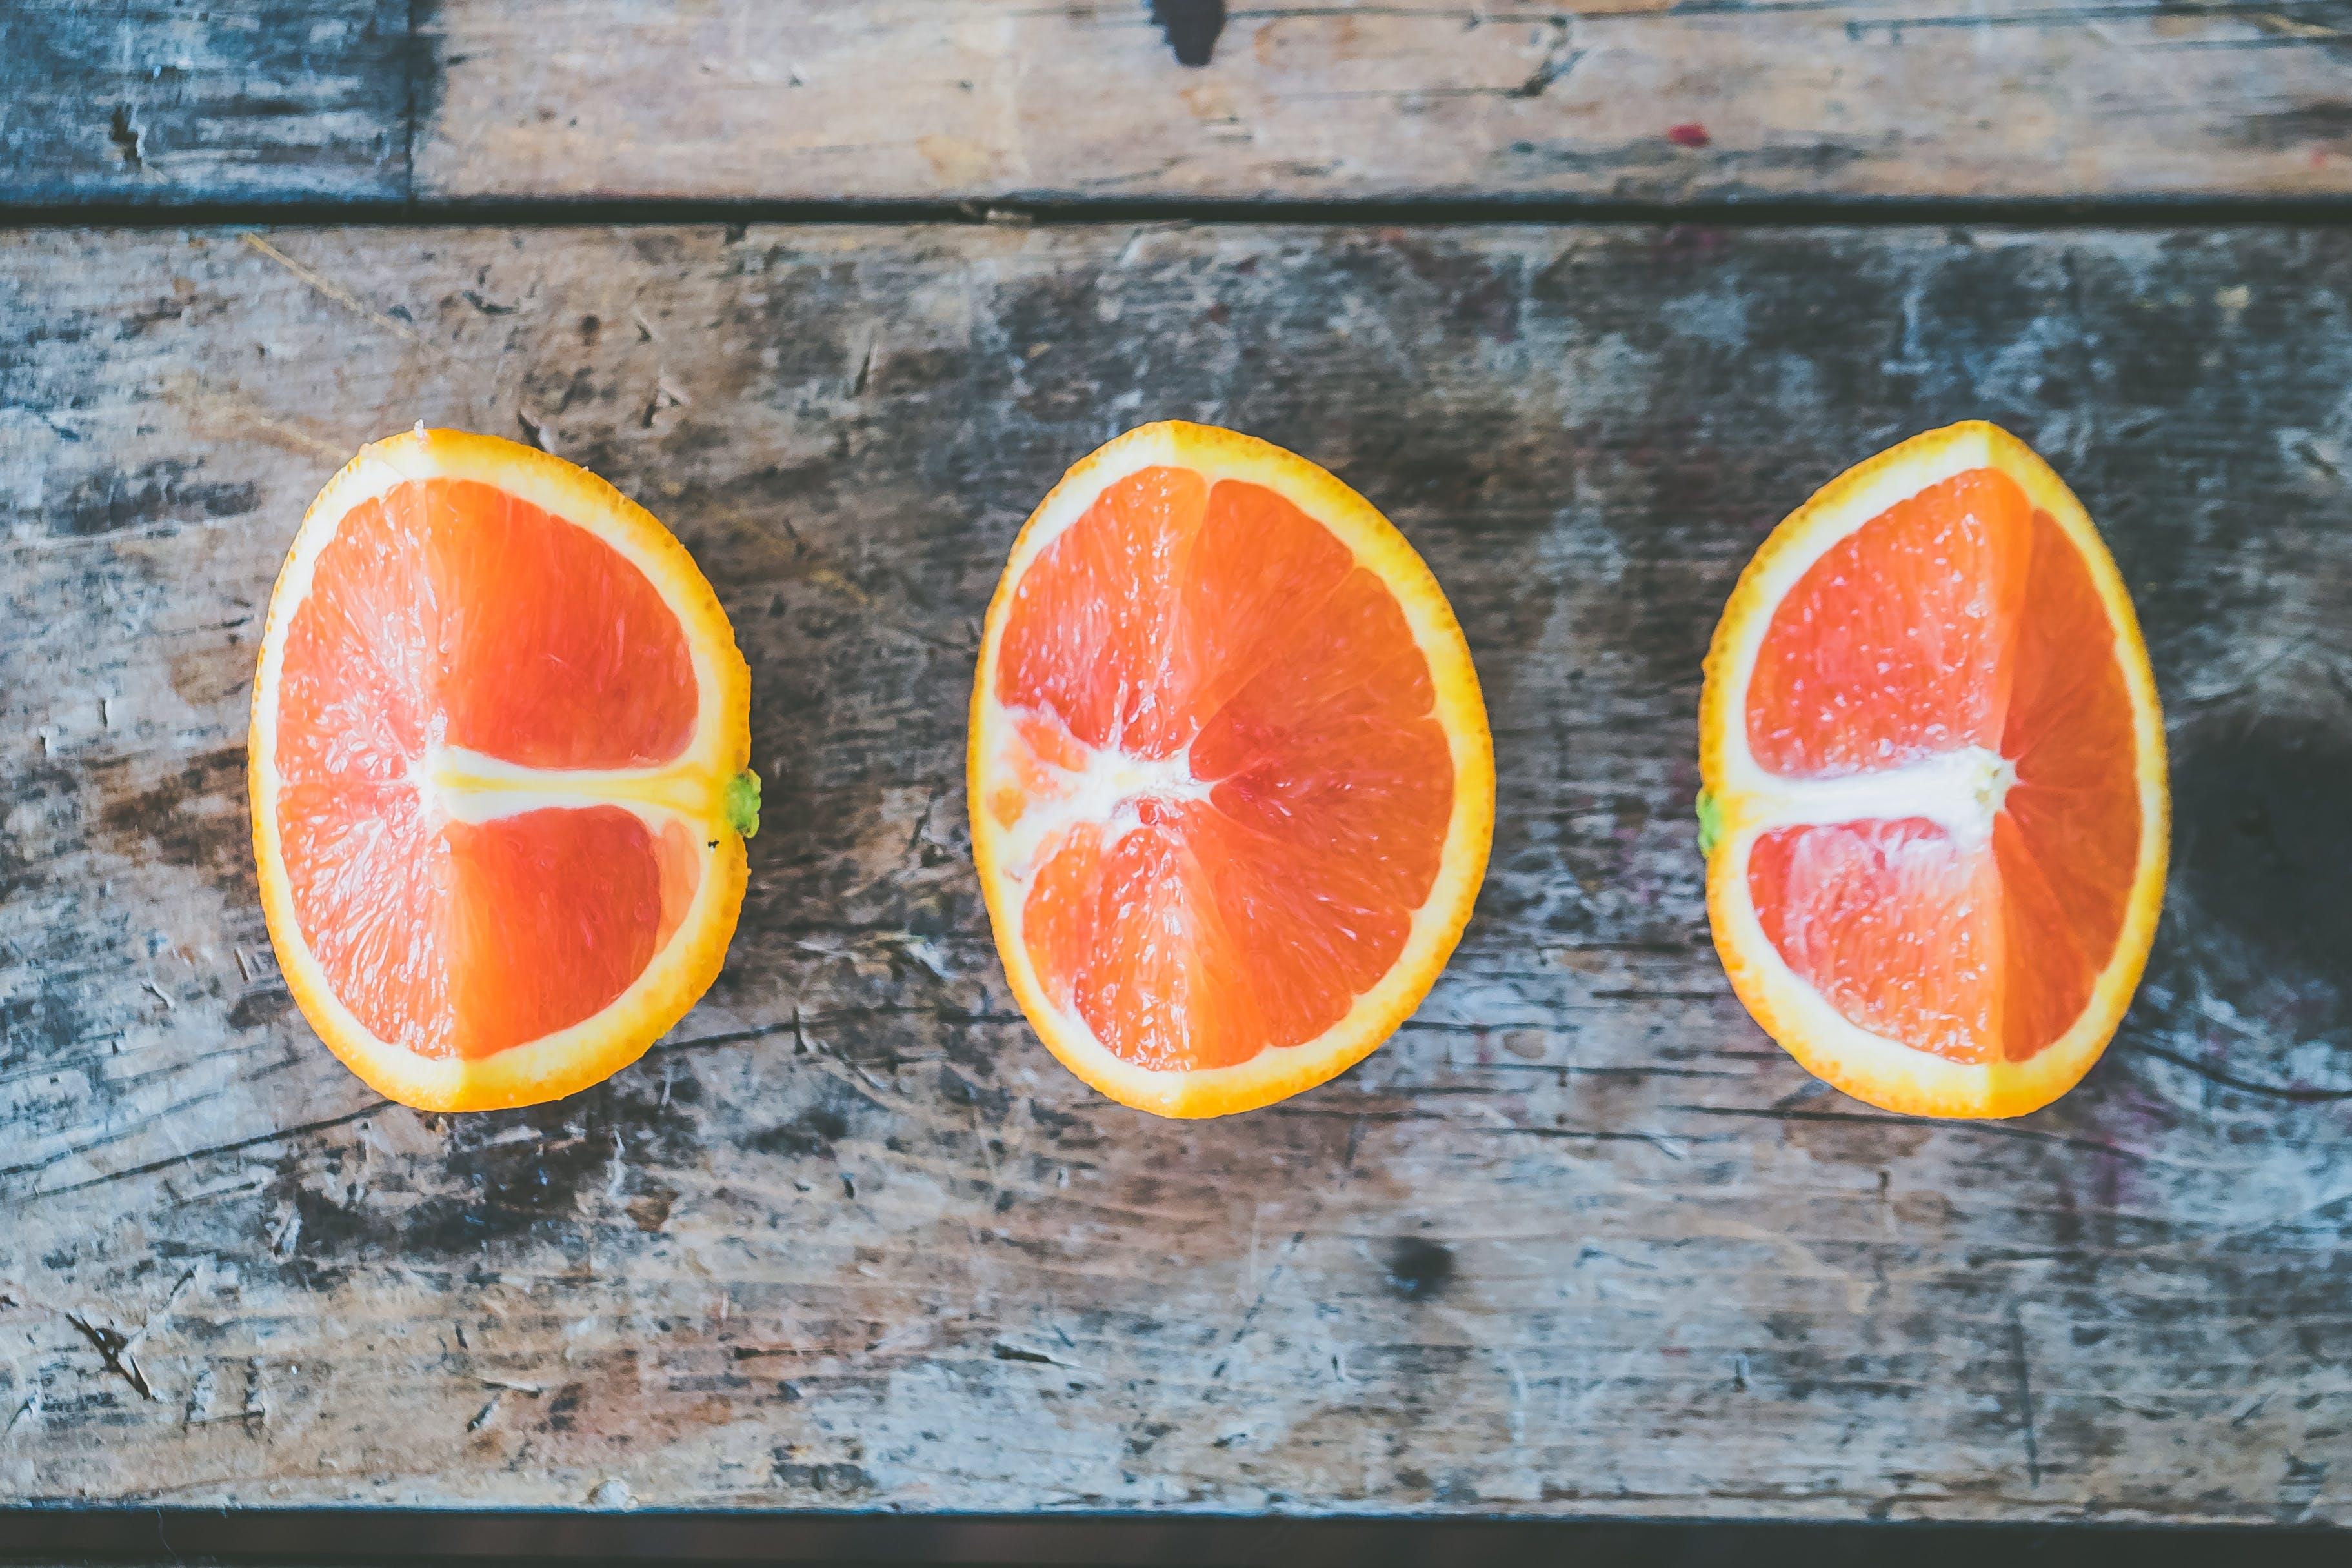 Three Slice of Citrus Fruits